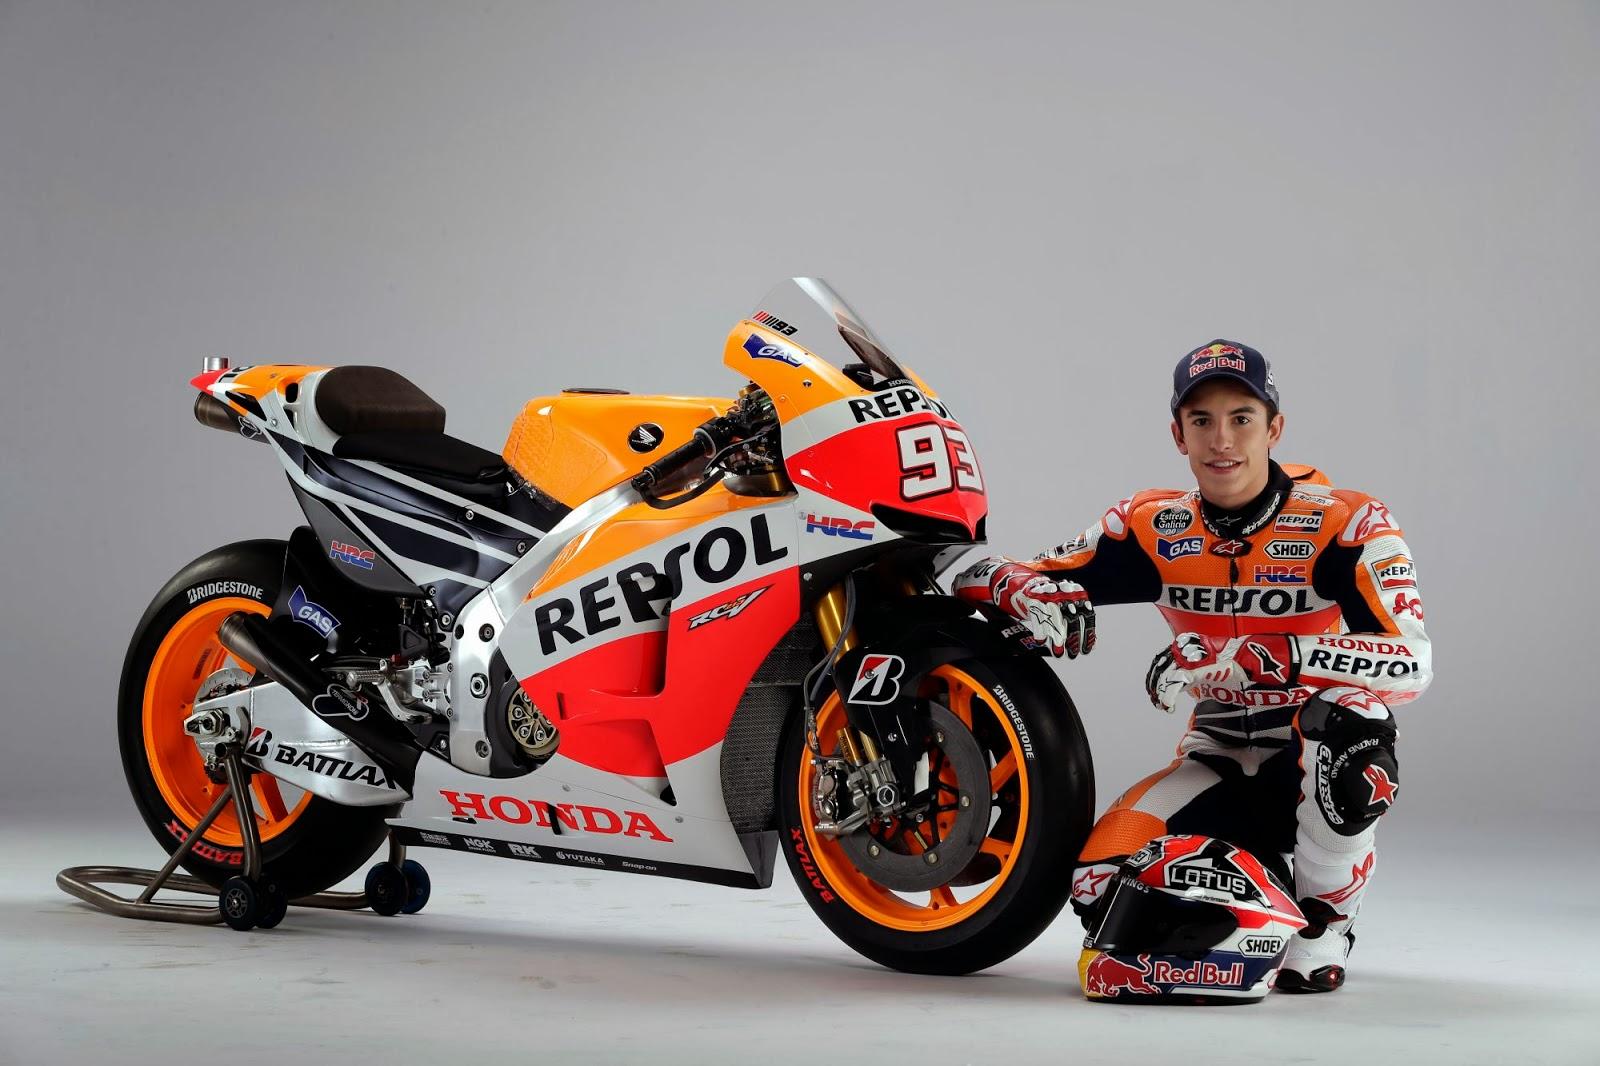 Sports Scandal: Marc Márquez youngest world champion in MotoGP